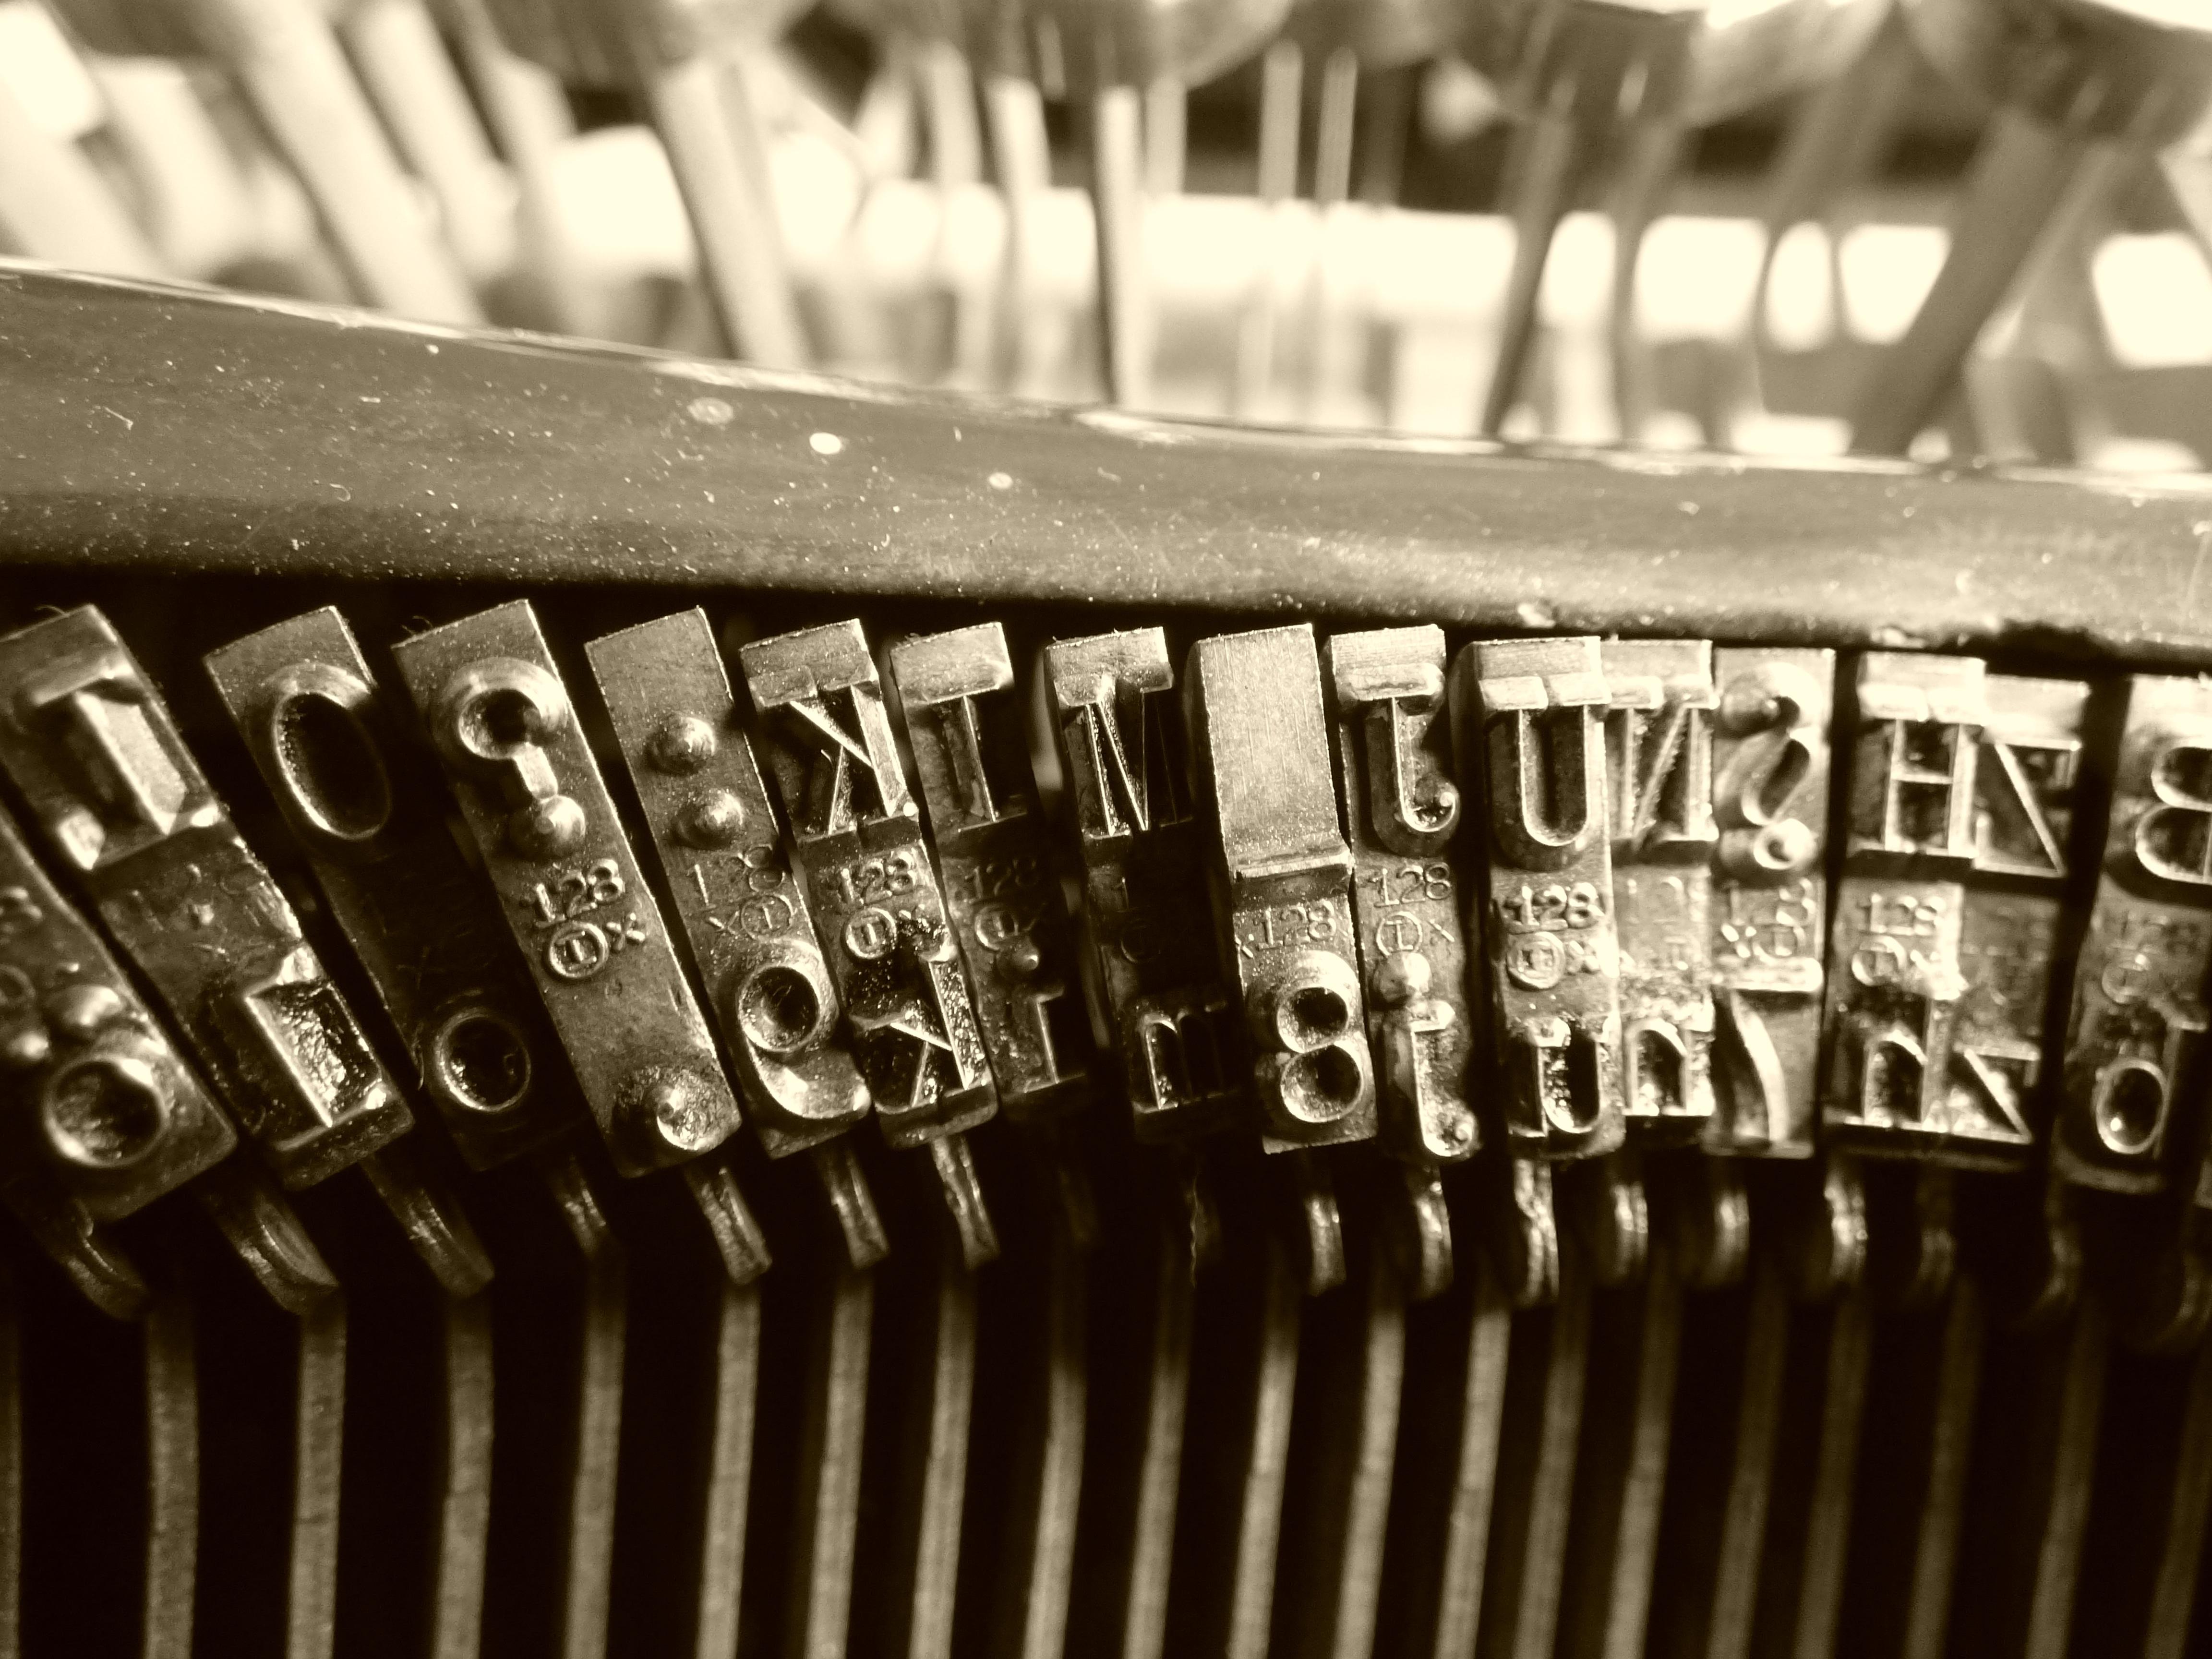 free images black and white old typewriter close up font